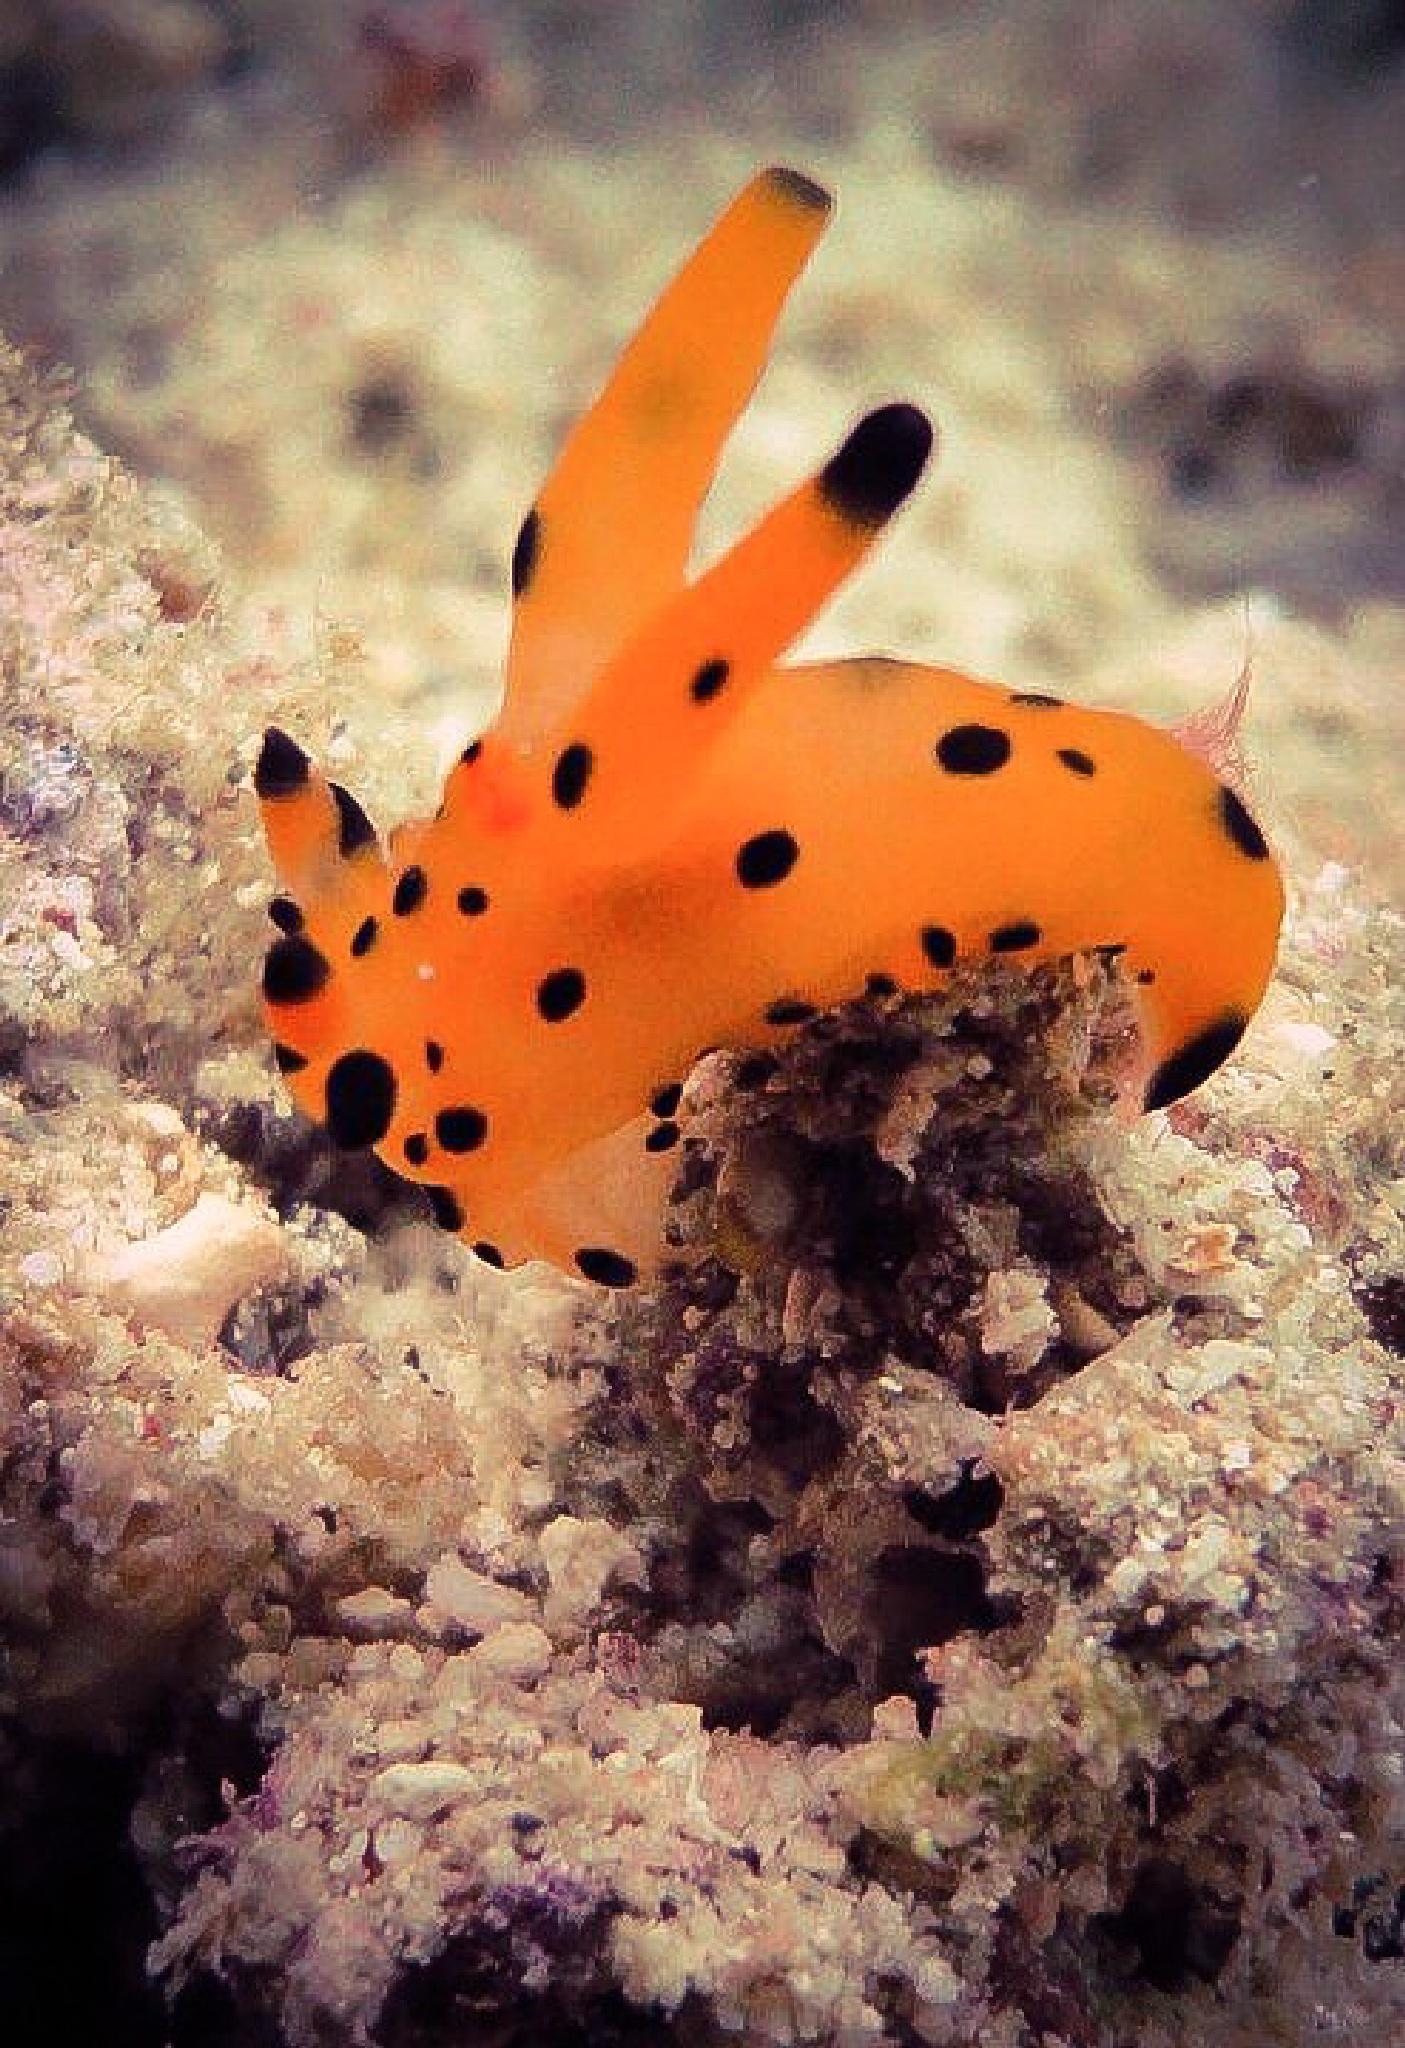 Nudibranch by RoarPhoto